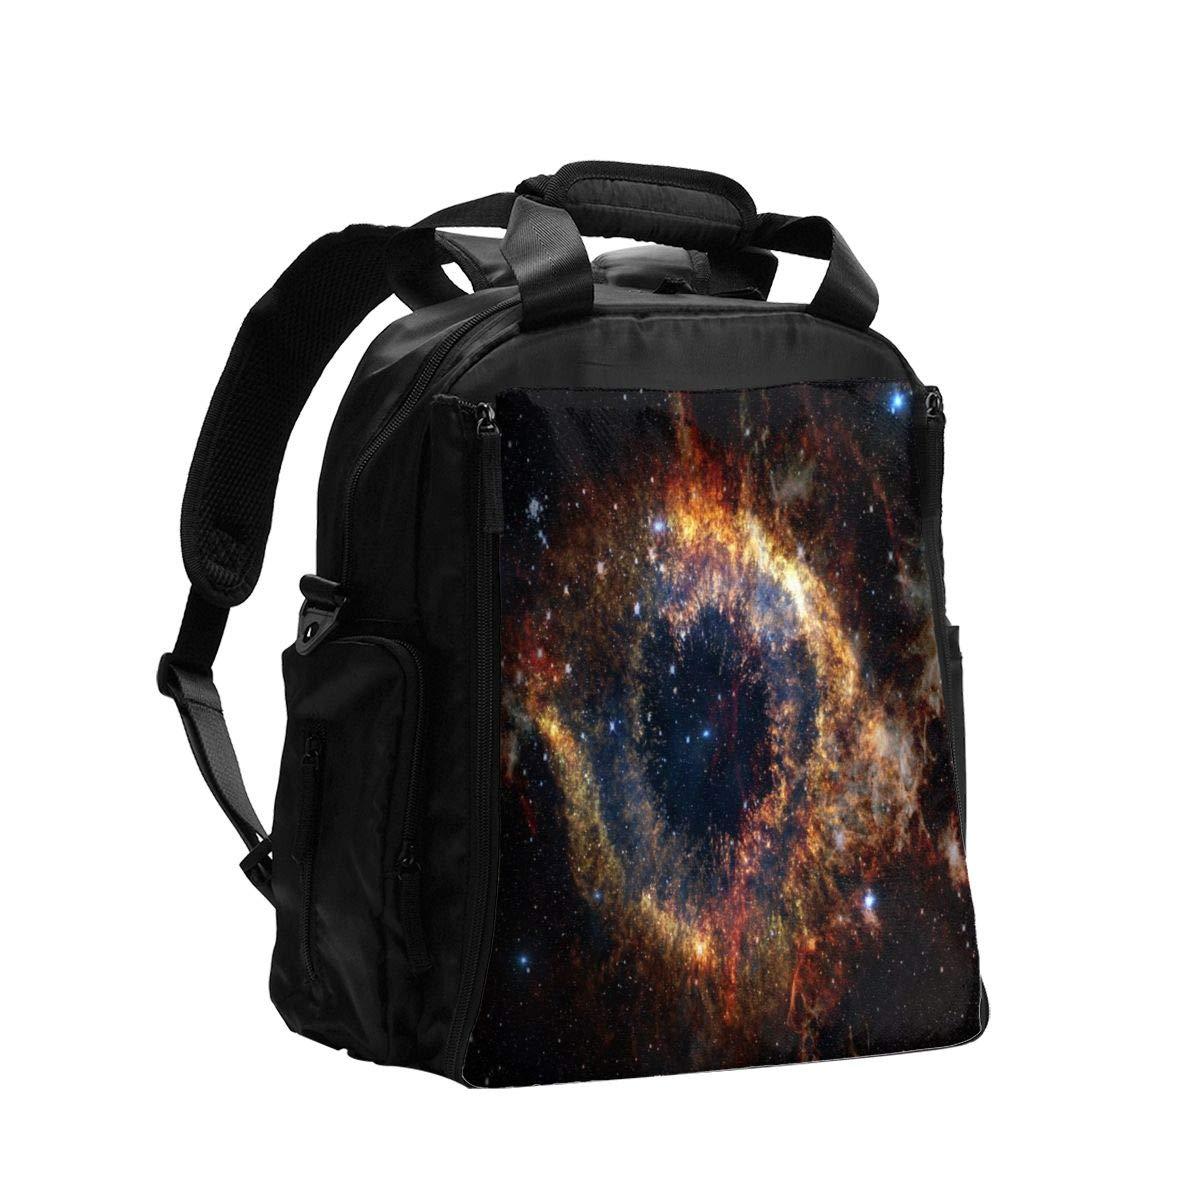 Diaper Bag Backpack Nebulas Star Galaxy Space Fearless Baby Diaper Bag Tote Travel Waterproof Dad Girls